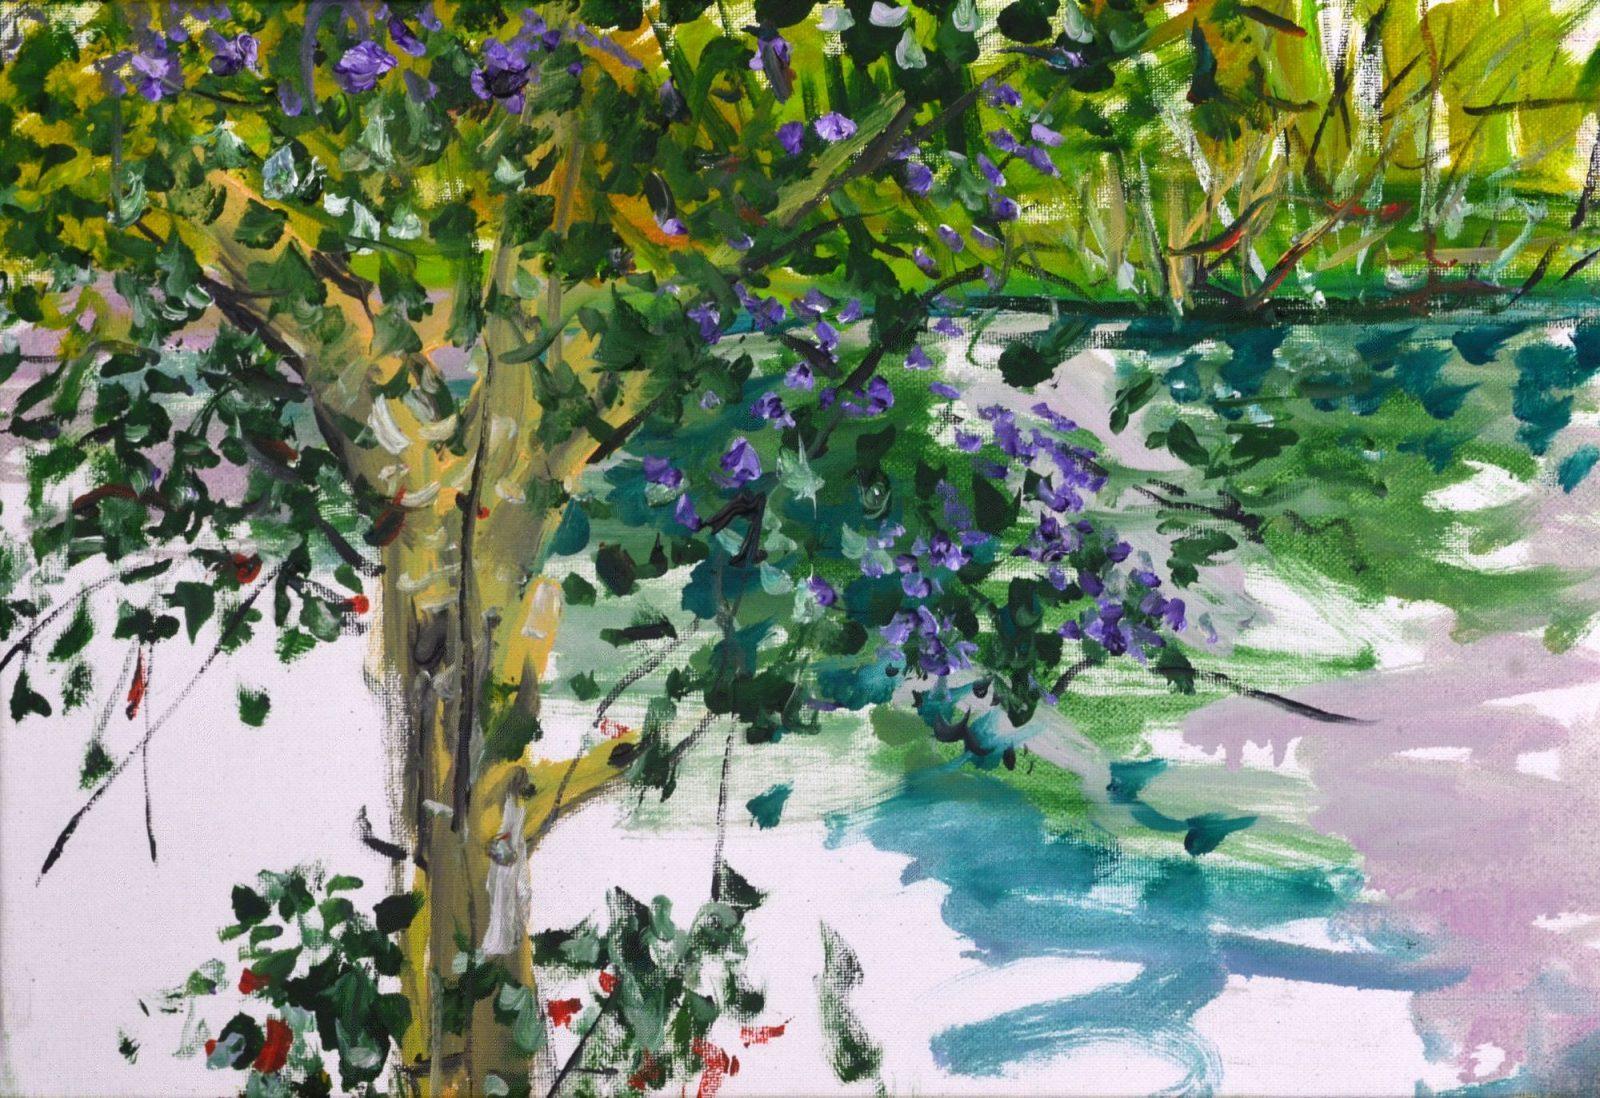 franyo aatoth: Garden Series 22.